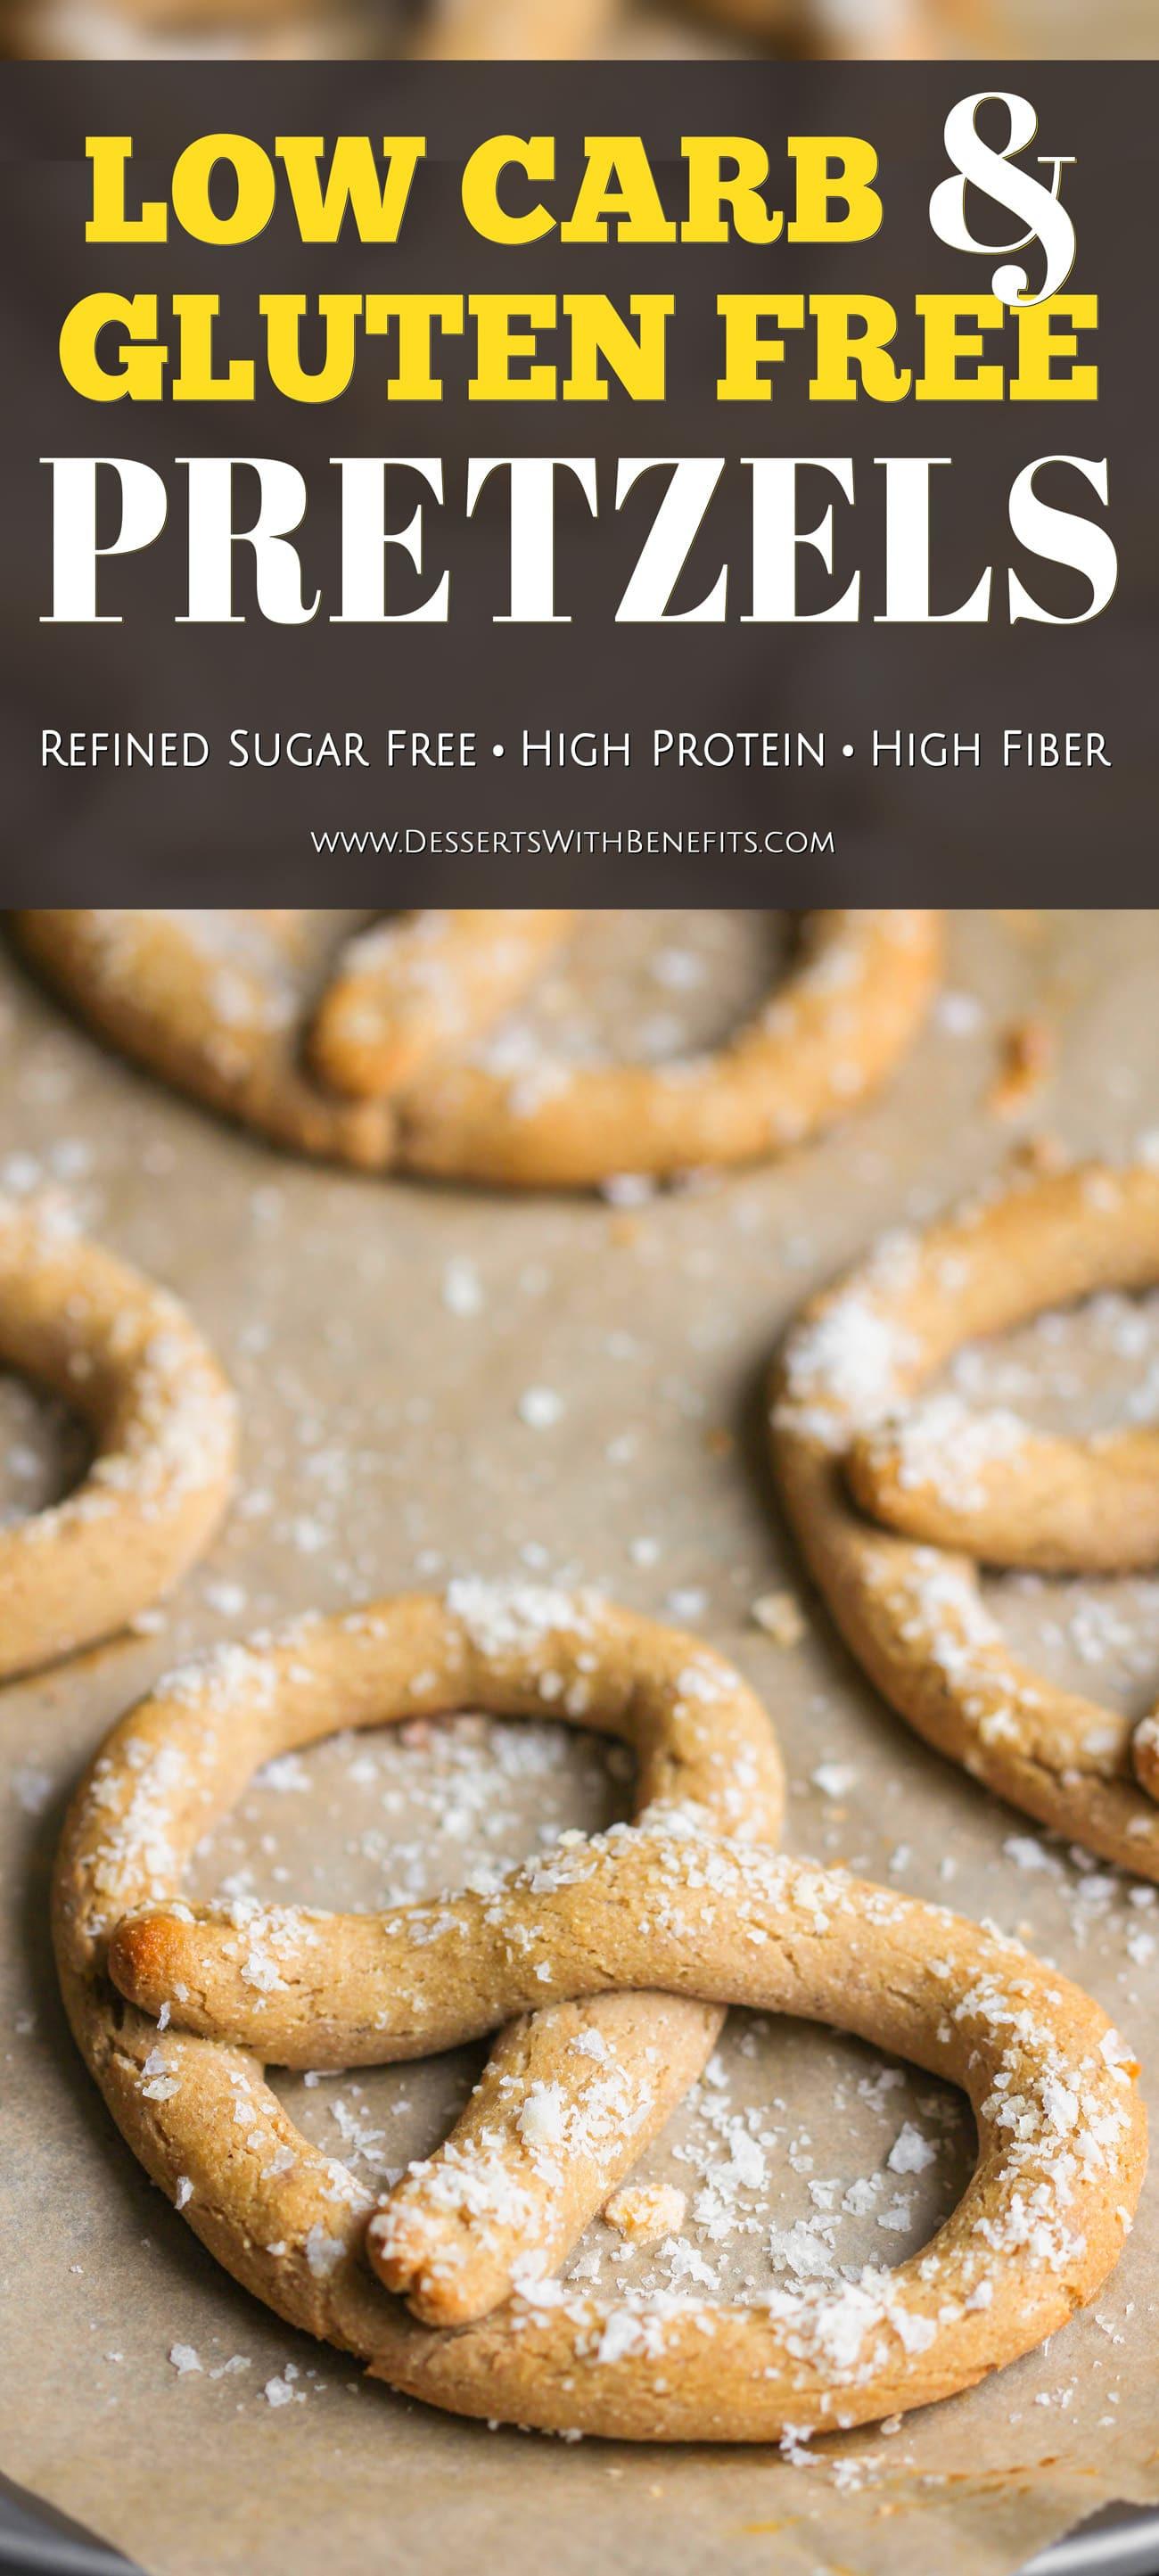 Low Fat Pretzels  Healthy Homemade Low Carb and Gluten Free Soft Pretzels Recipe